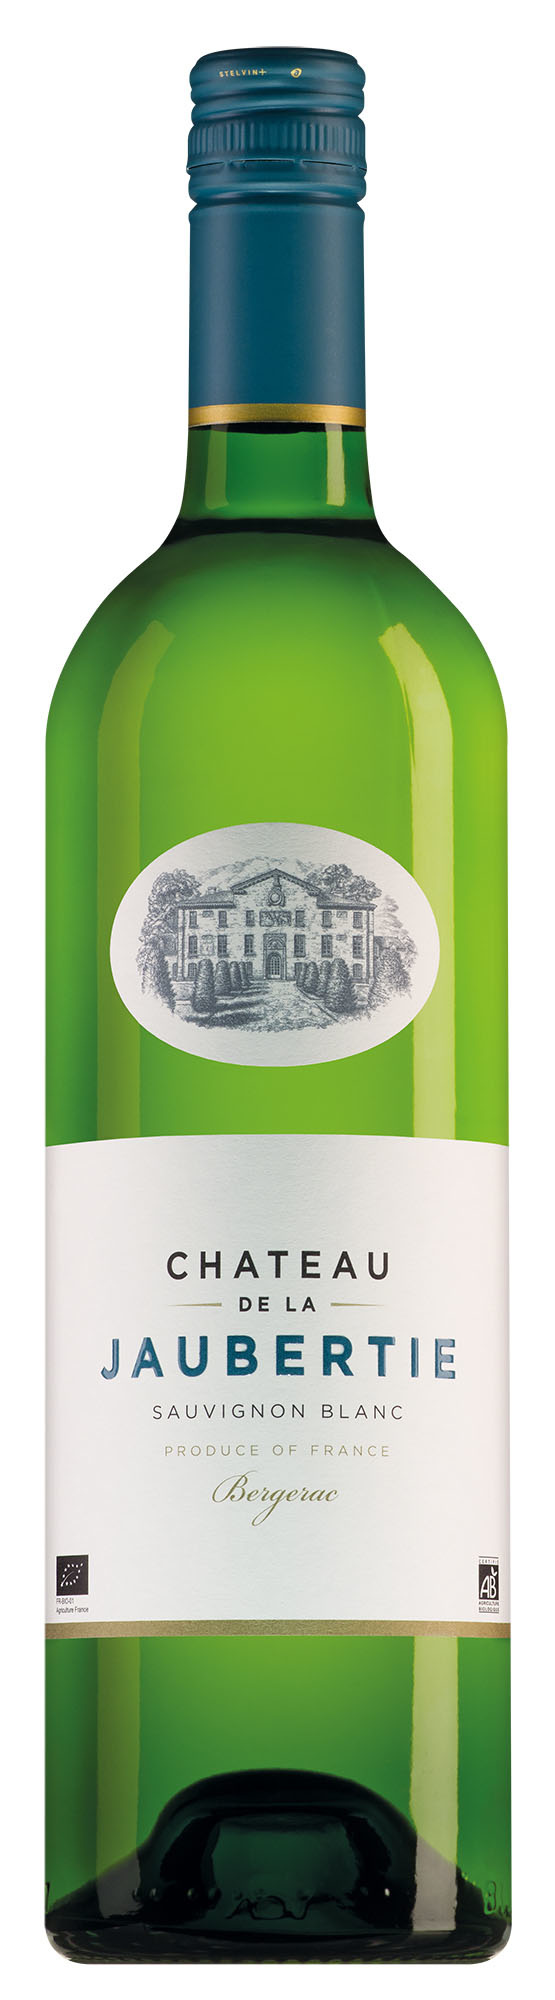 Château de la Jaubertie Bergerac Blanc 2020